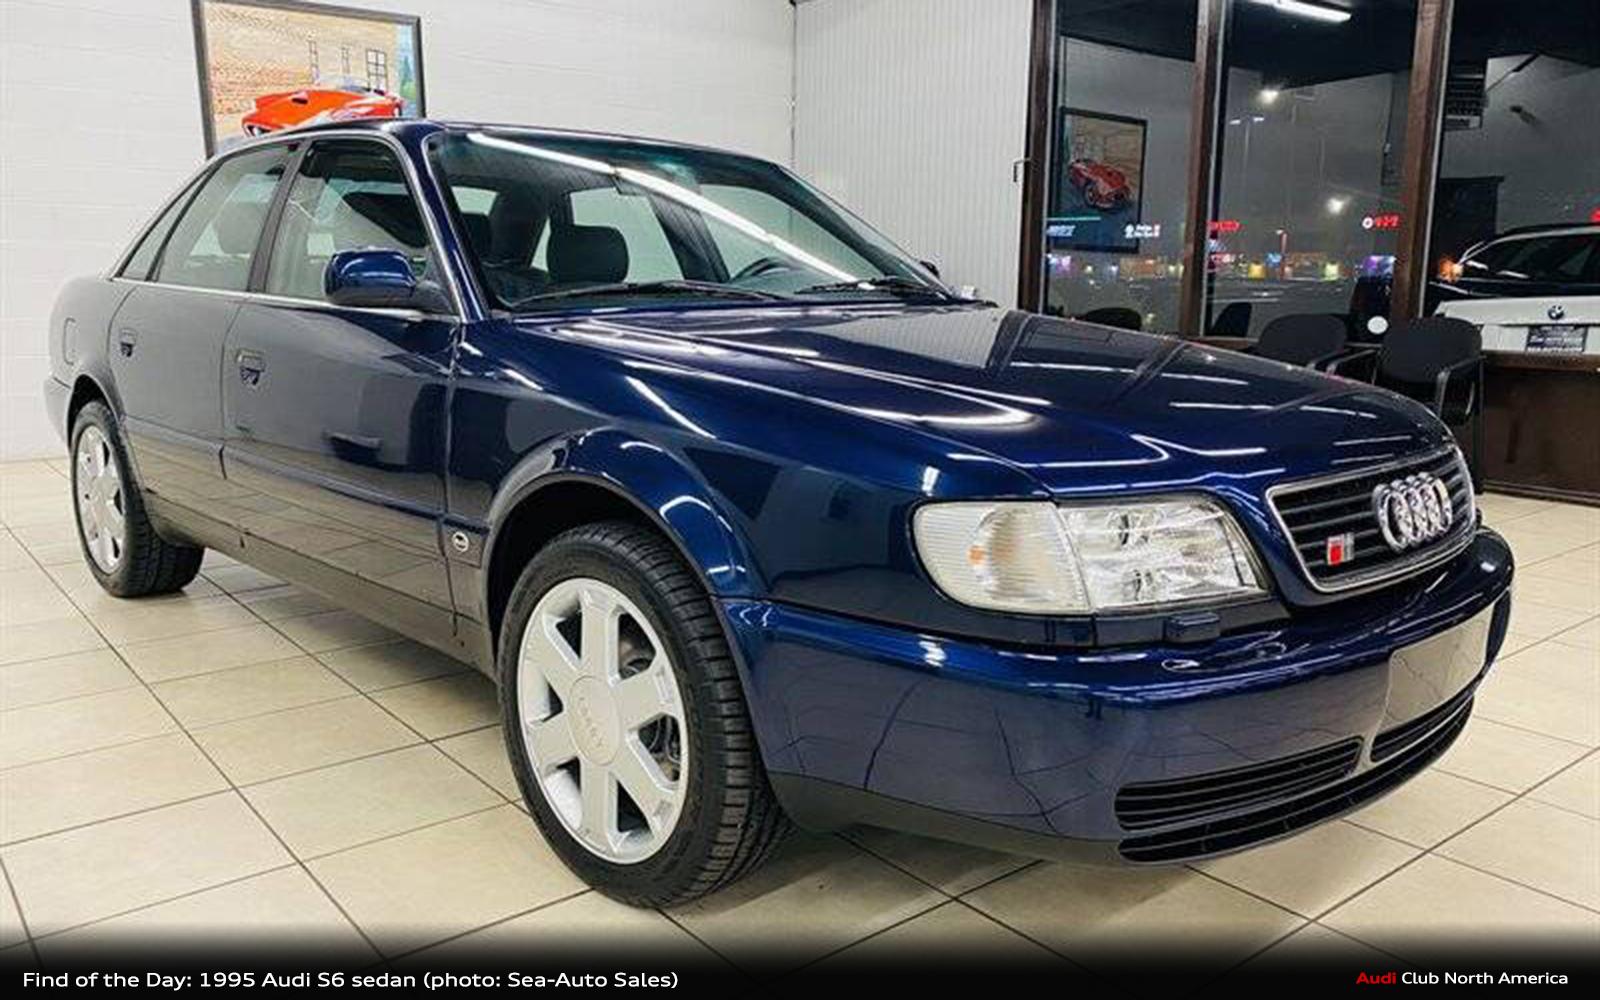 Find of the Day: 1995 Audi S6 Sedan